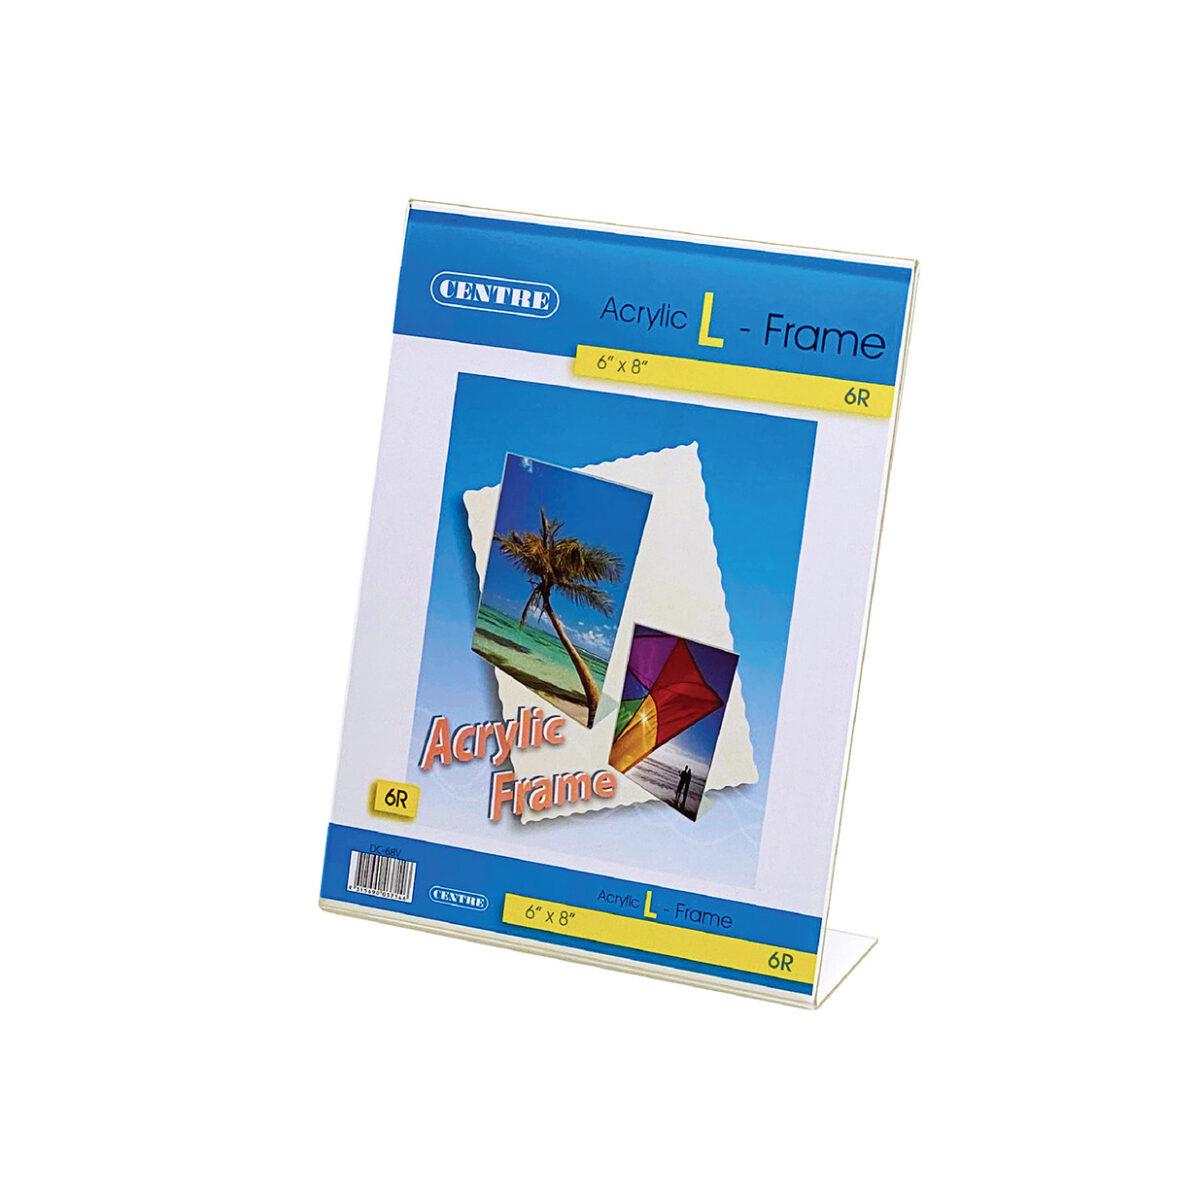 Centre Acrylic Picture Frame - L Stand Portrait 6R